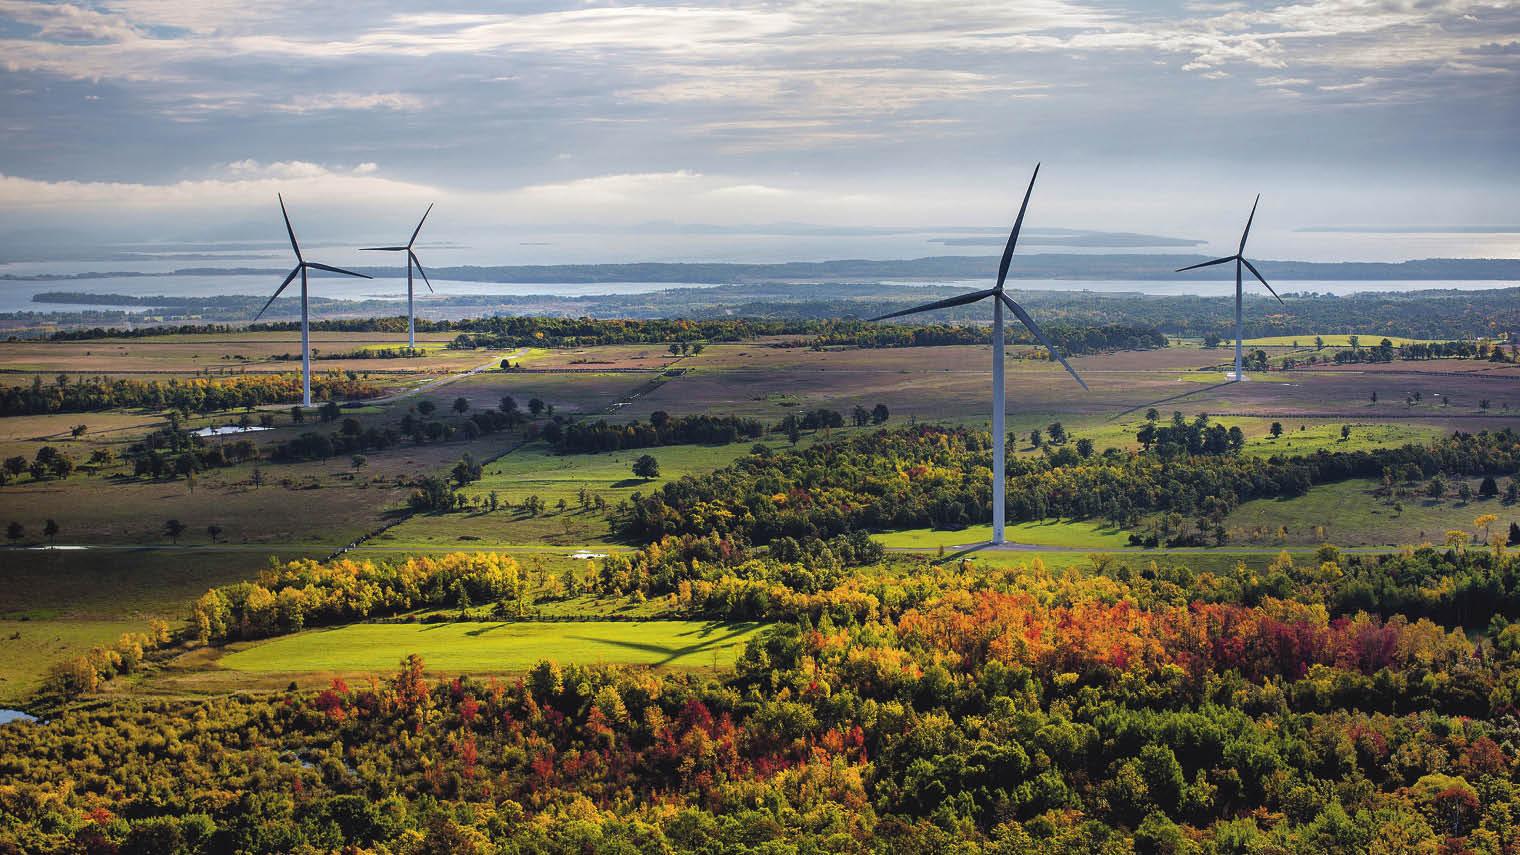 Real windfarms - digital twinning